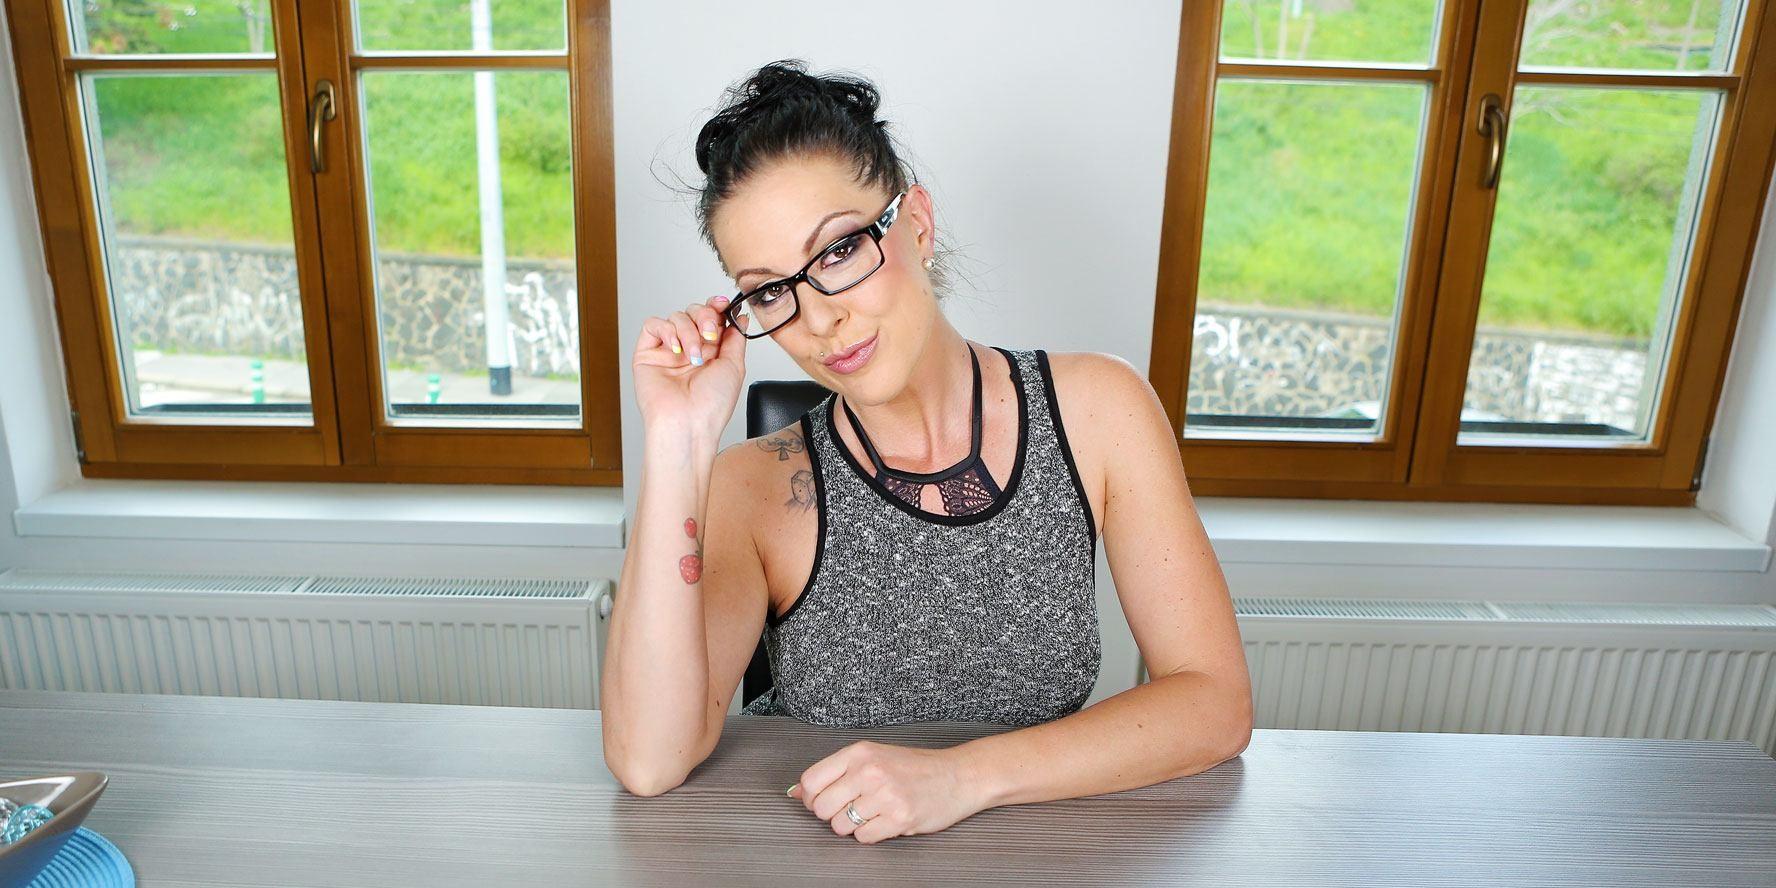 Aiden Starr Niki Dominick Juliette March Amateur Bondage Femdom